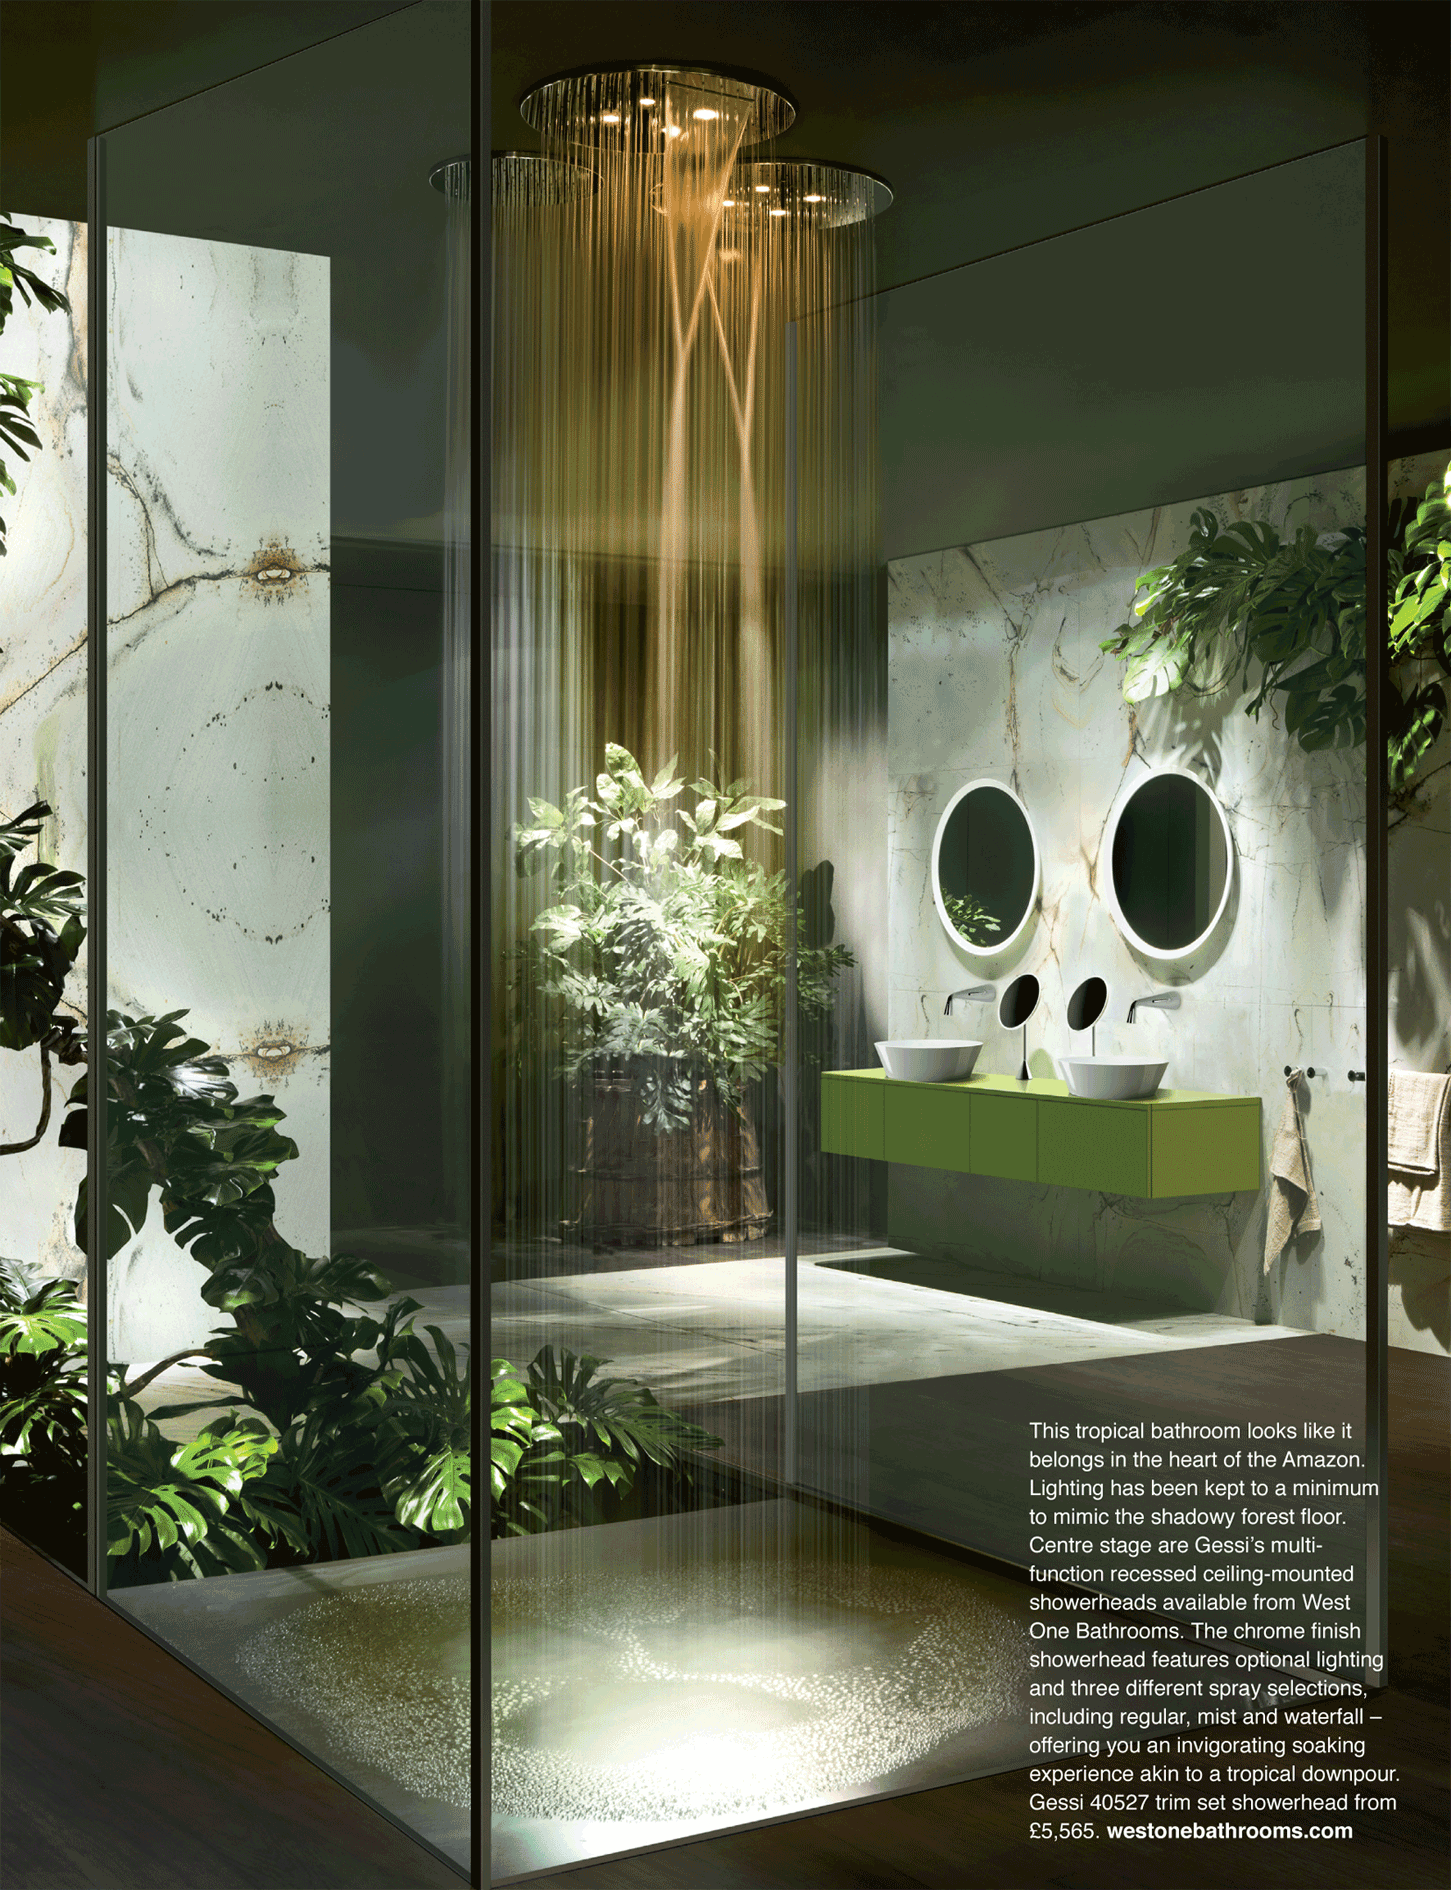 The Tropical Bathroom Looks Like It Belongs In The Heart Of The